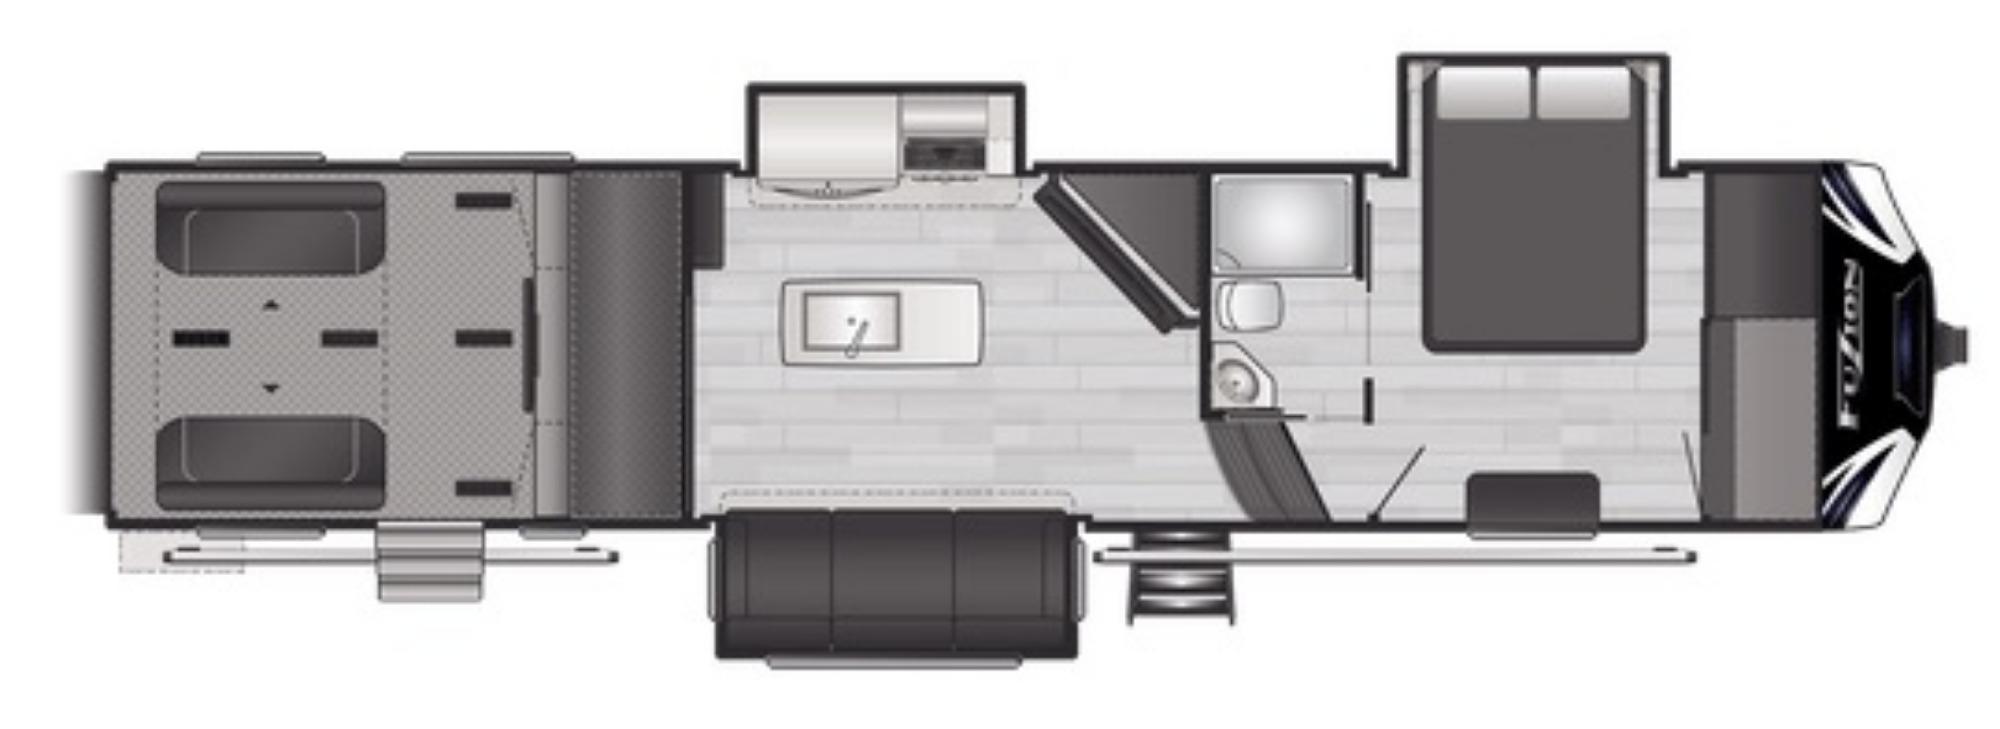 View Floor Plan for 2021 KEYSTONE FUZION 357